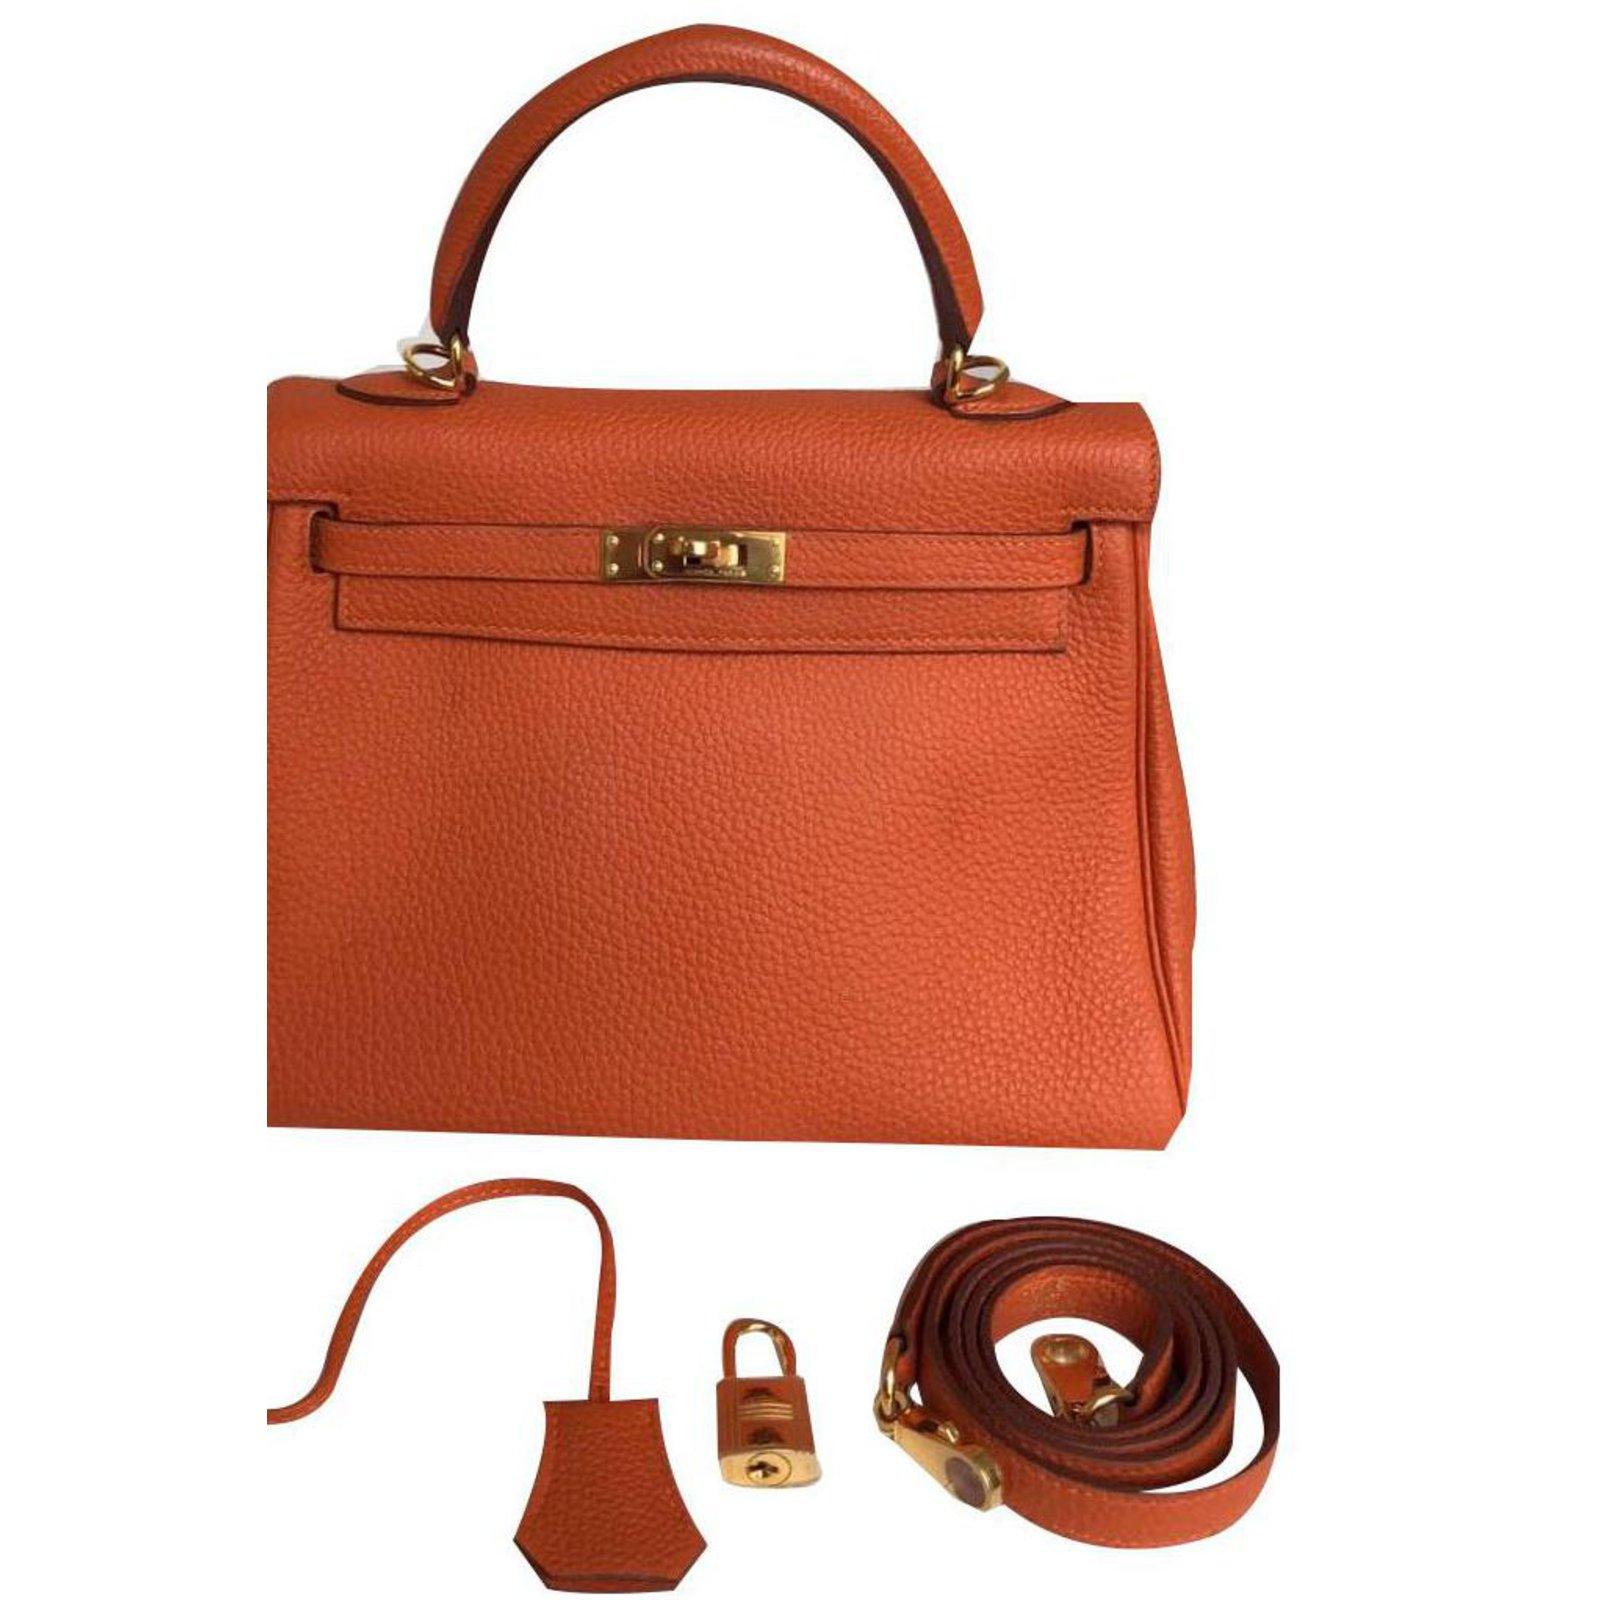 ba3a996b5a33 Hermès Kelly 25 Handbags Leather Orange ref.76108 - Joli Closet